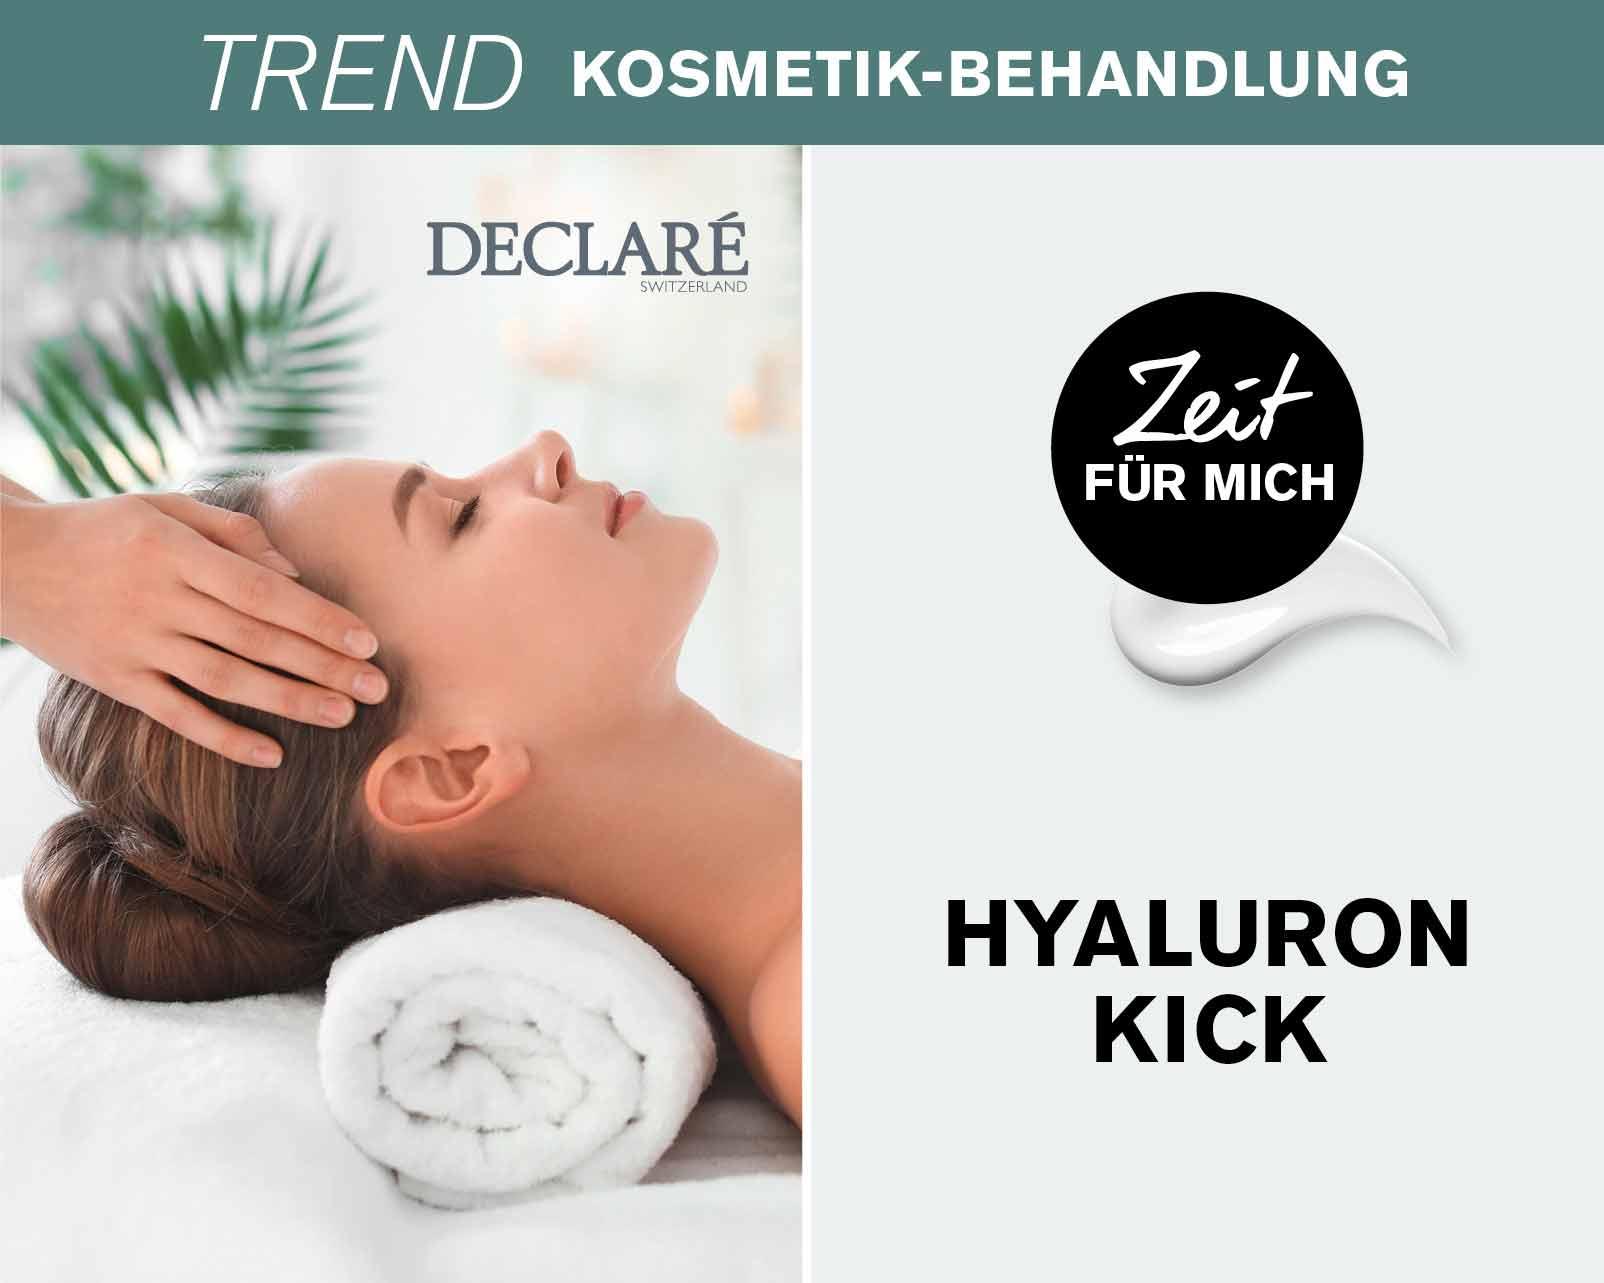 Declaré Hyaluron Kick Trendbehandlung